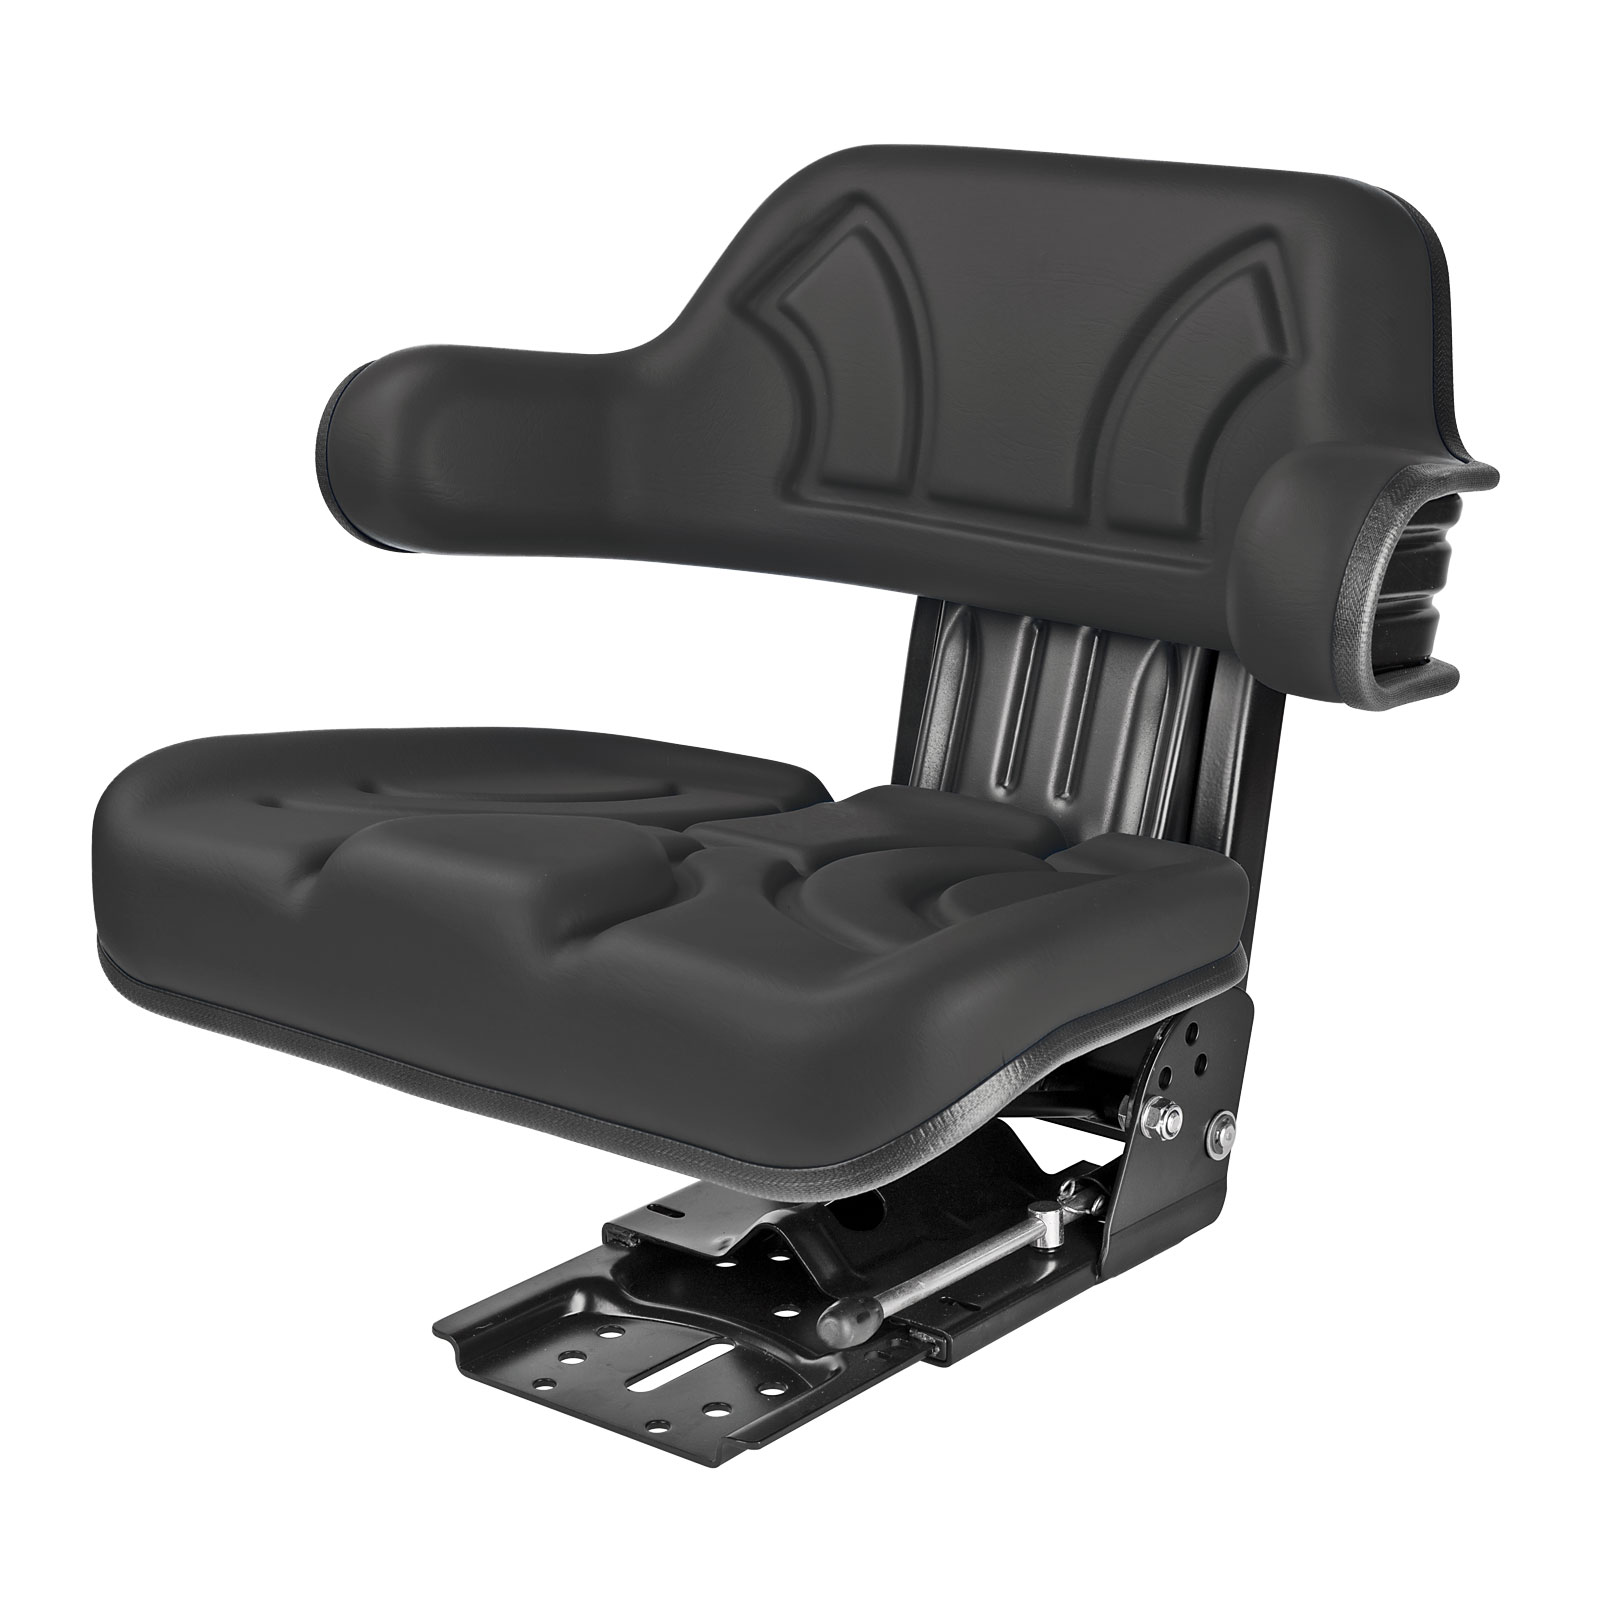 Schleppersitz-ST10-Traktorsitz-Sitz-52414